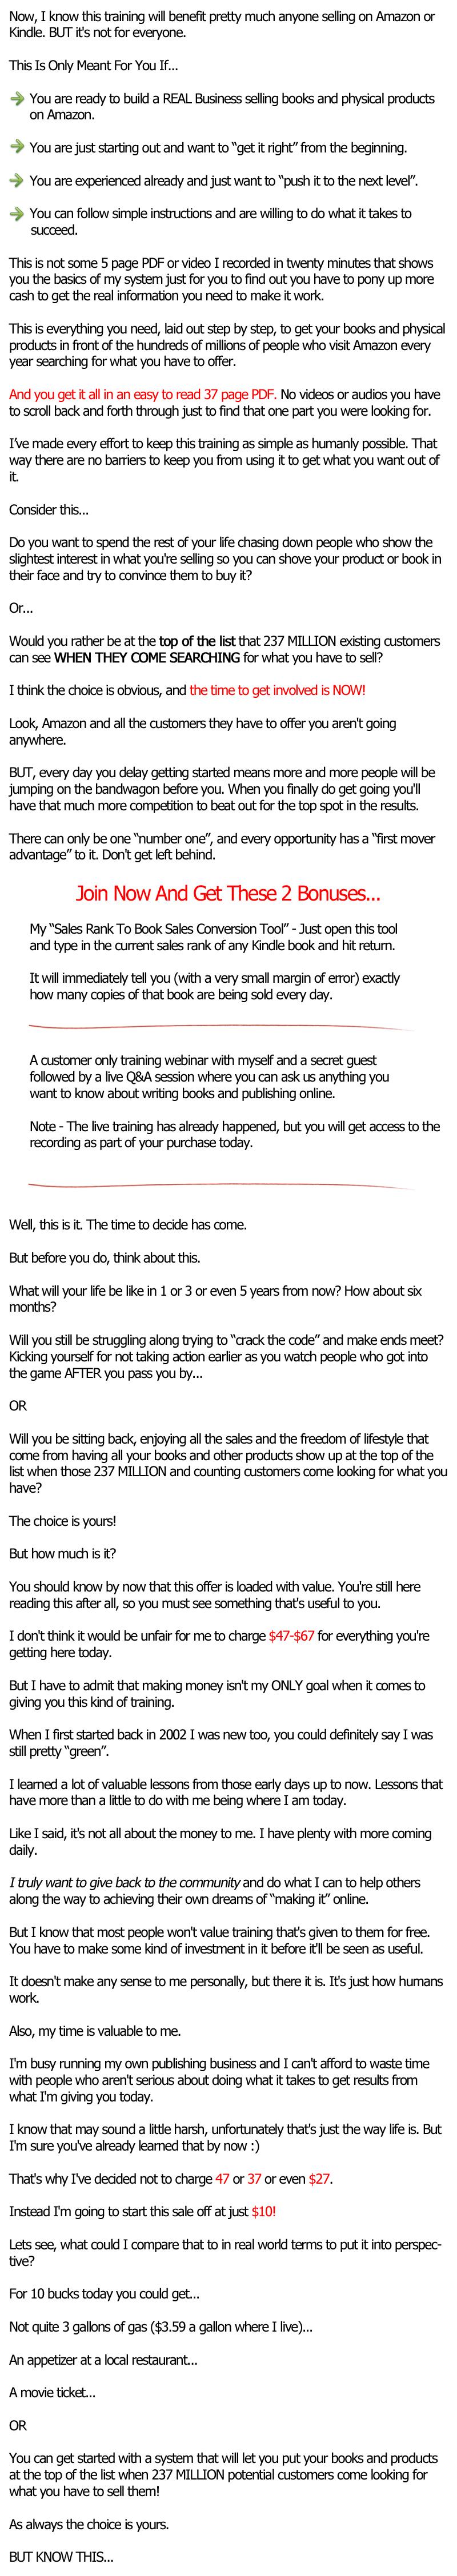 Amazon-Search-Dominator-Sales-Page-5